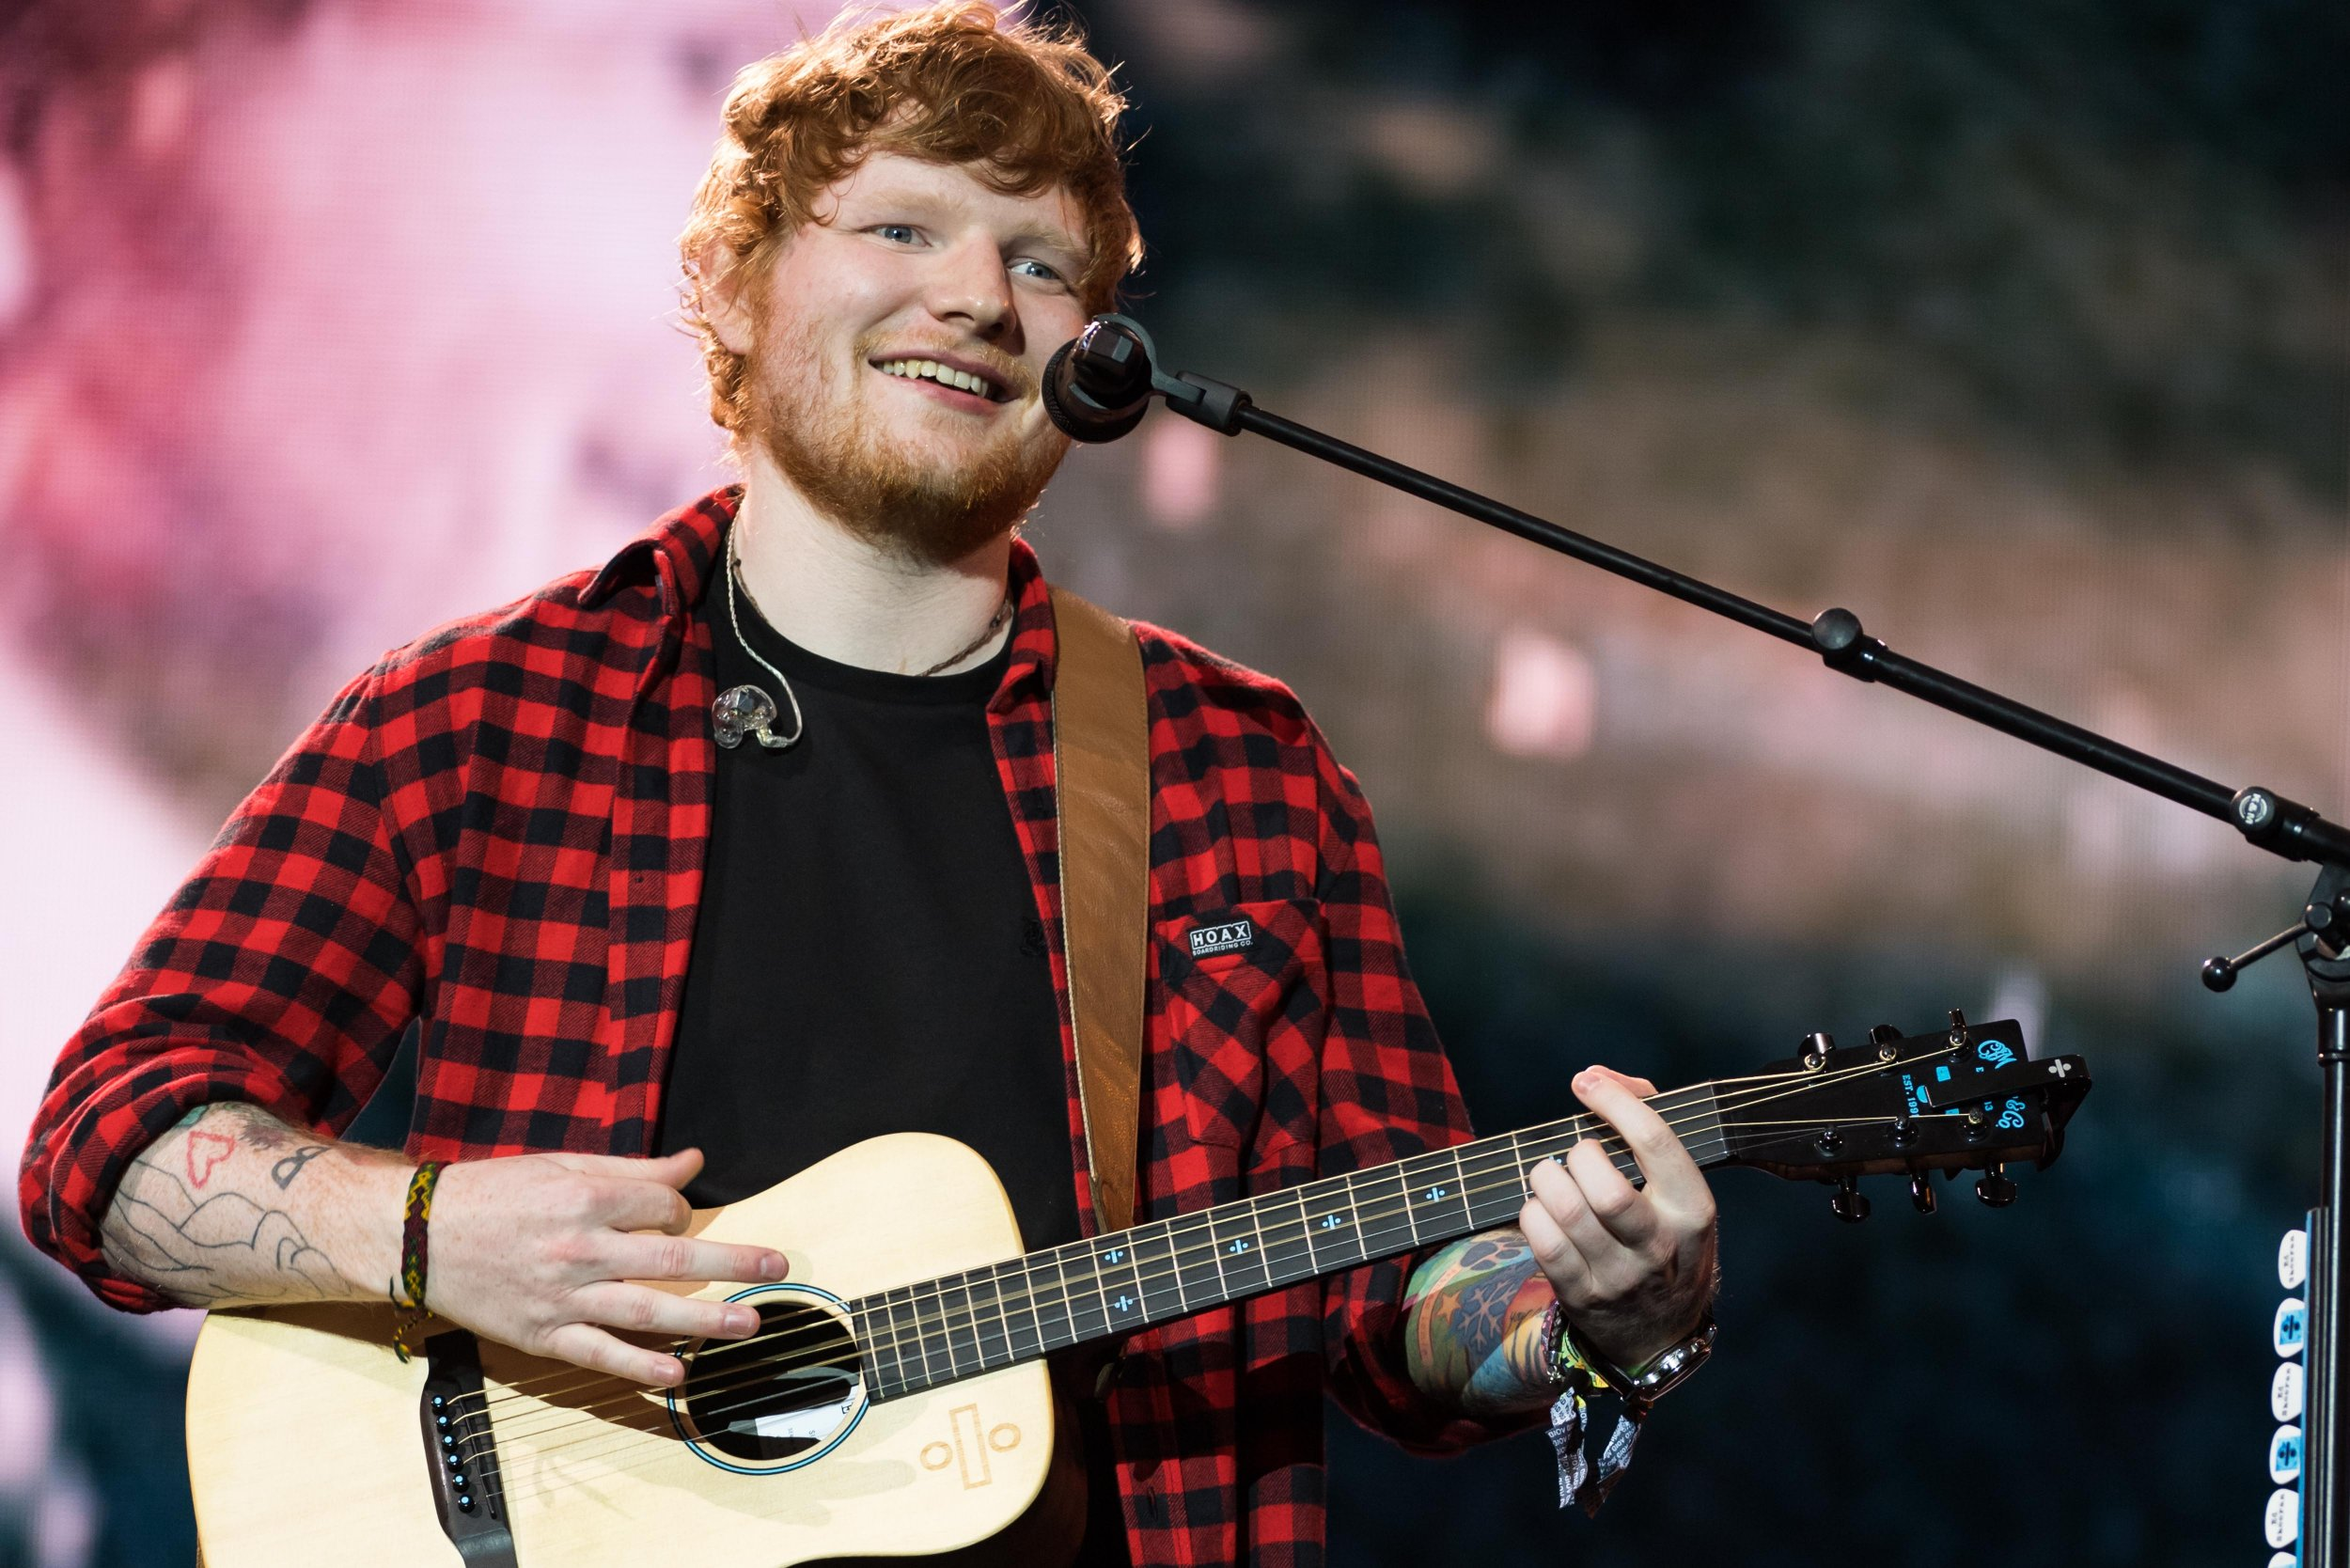 Ed Sheeran's Game of Thrones cameo